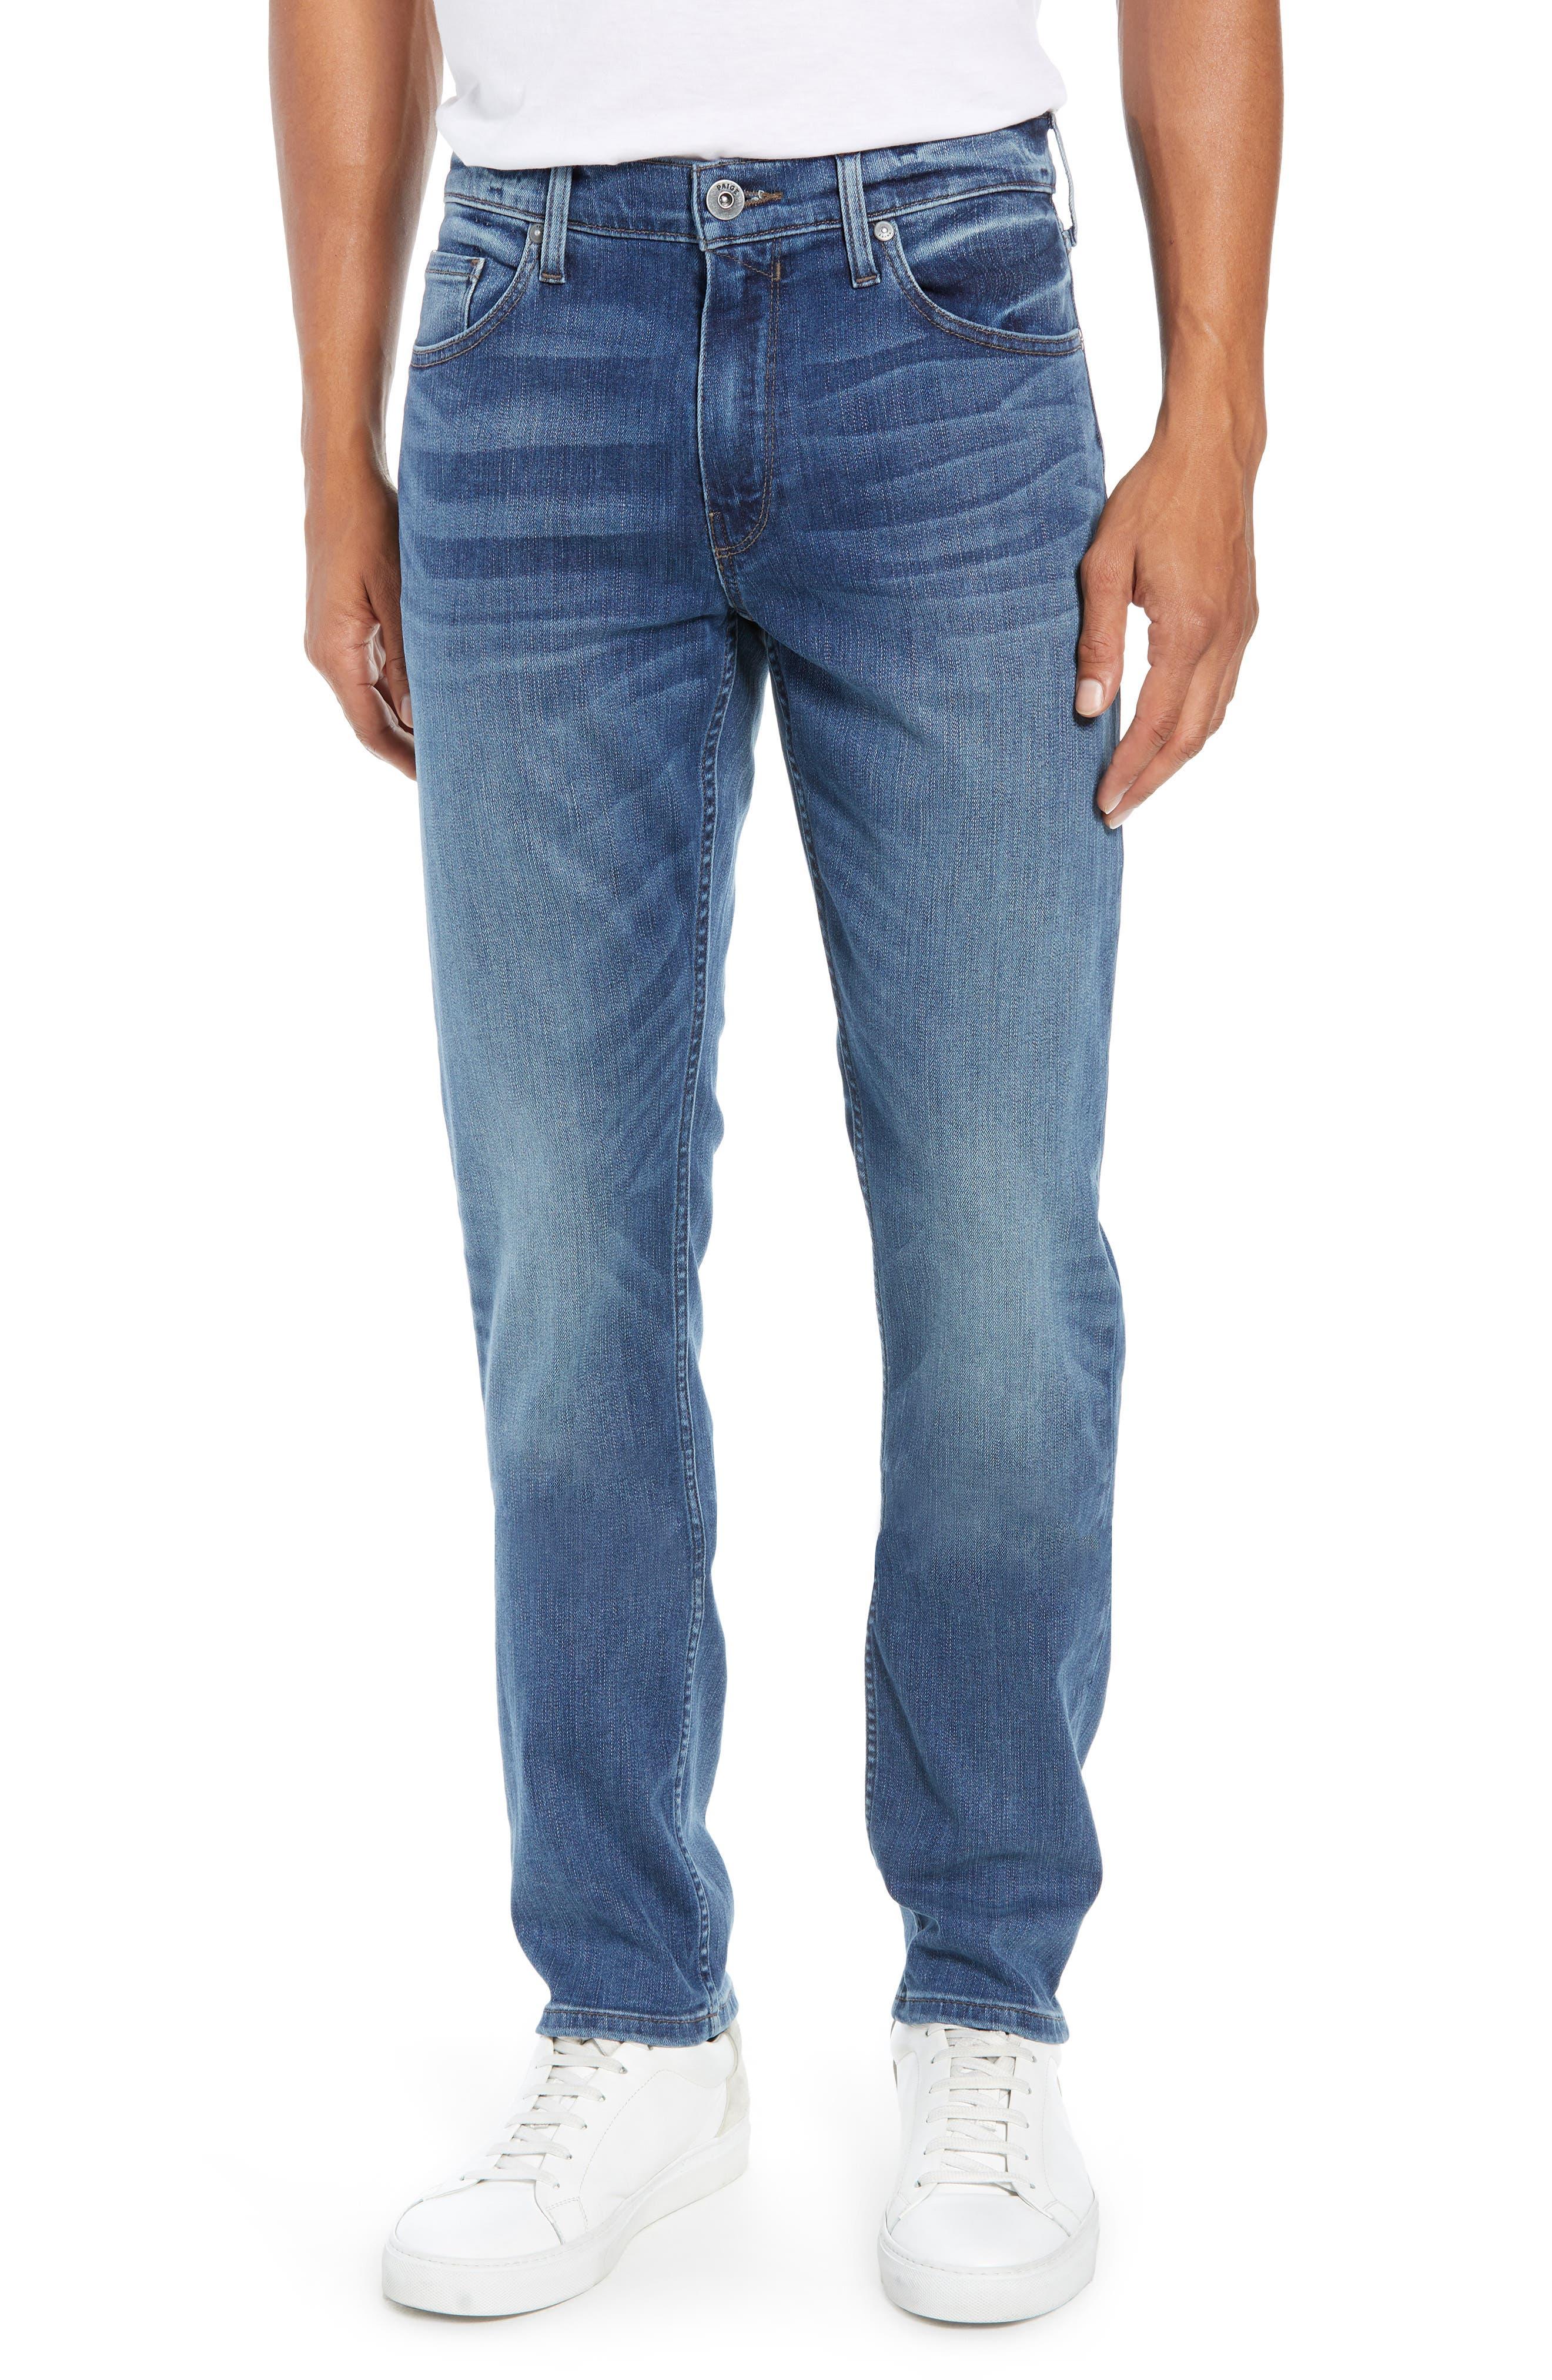 Transcend Vintage - Lennox Slim Fit Jeans,                         Main,                         color, 400